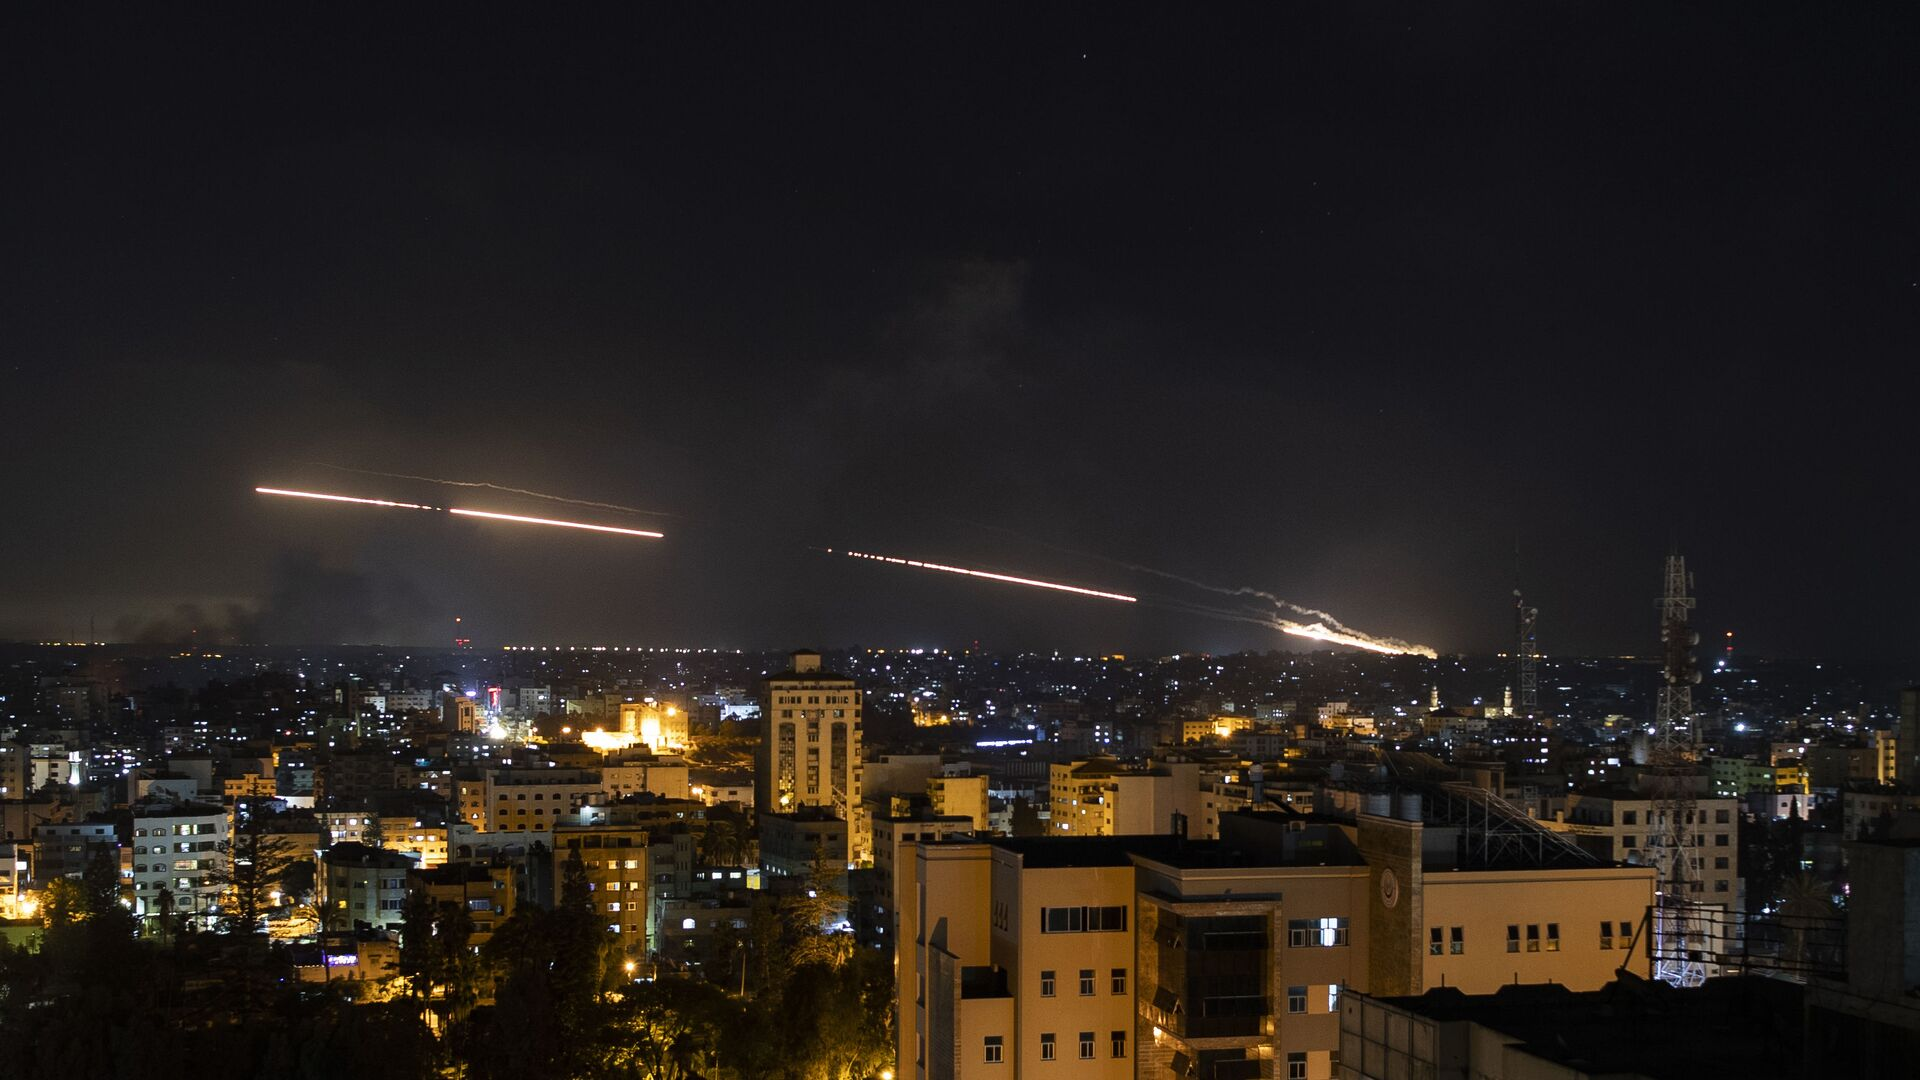 Rakety vypuštěné z Pásma Gazy na Izrael - Sputnik Česká republika, 1920, 14.05.2021